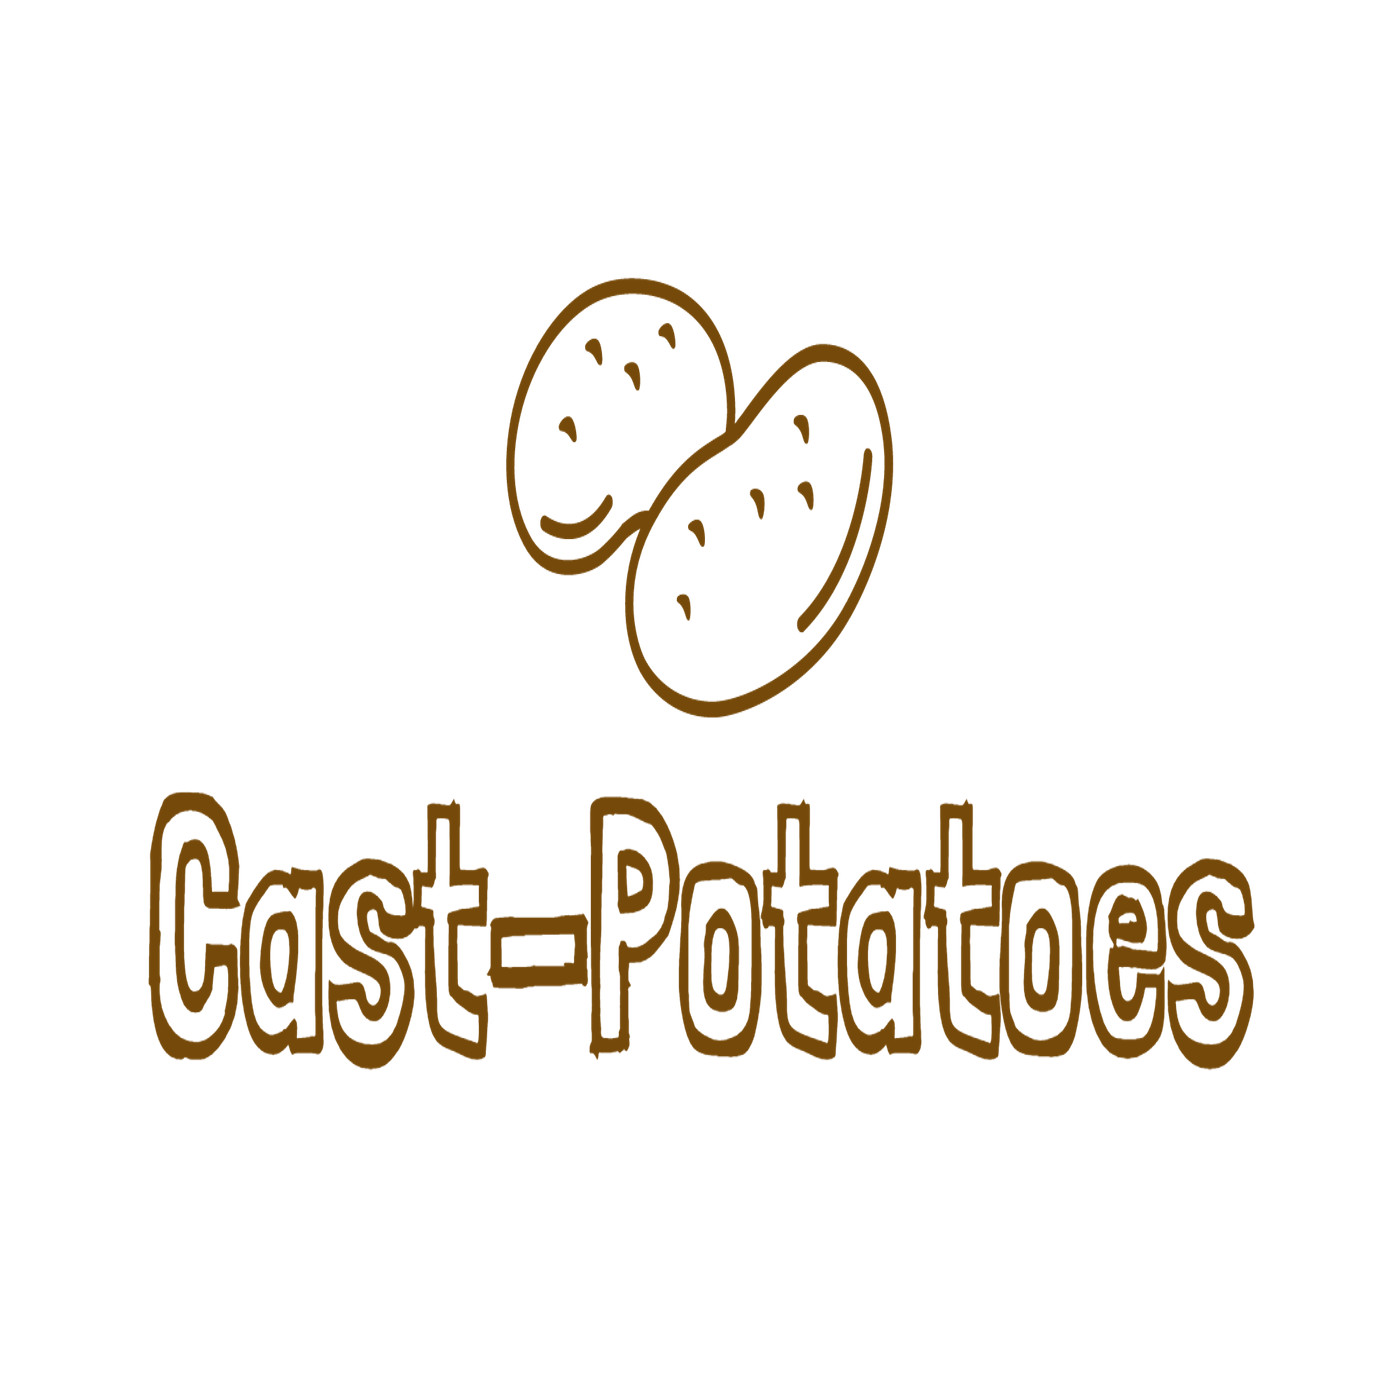 Cast-Potatoes